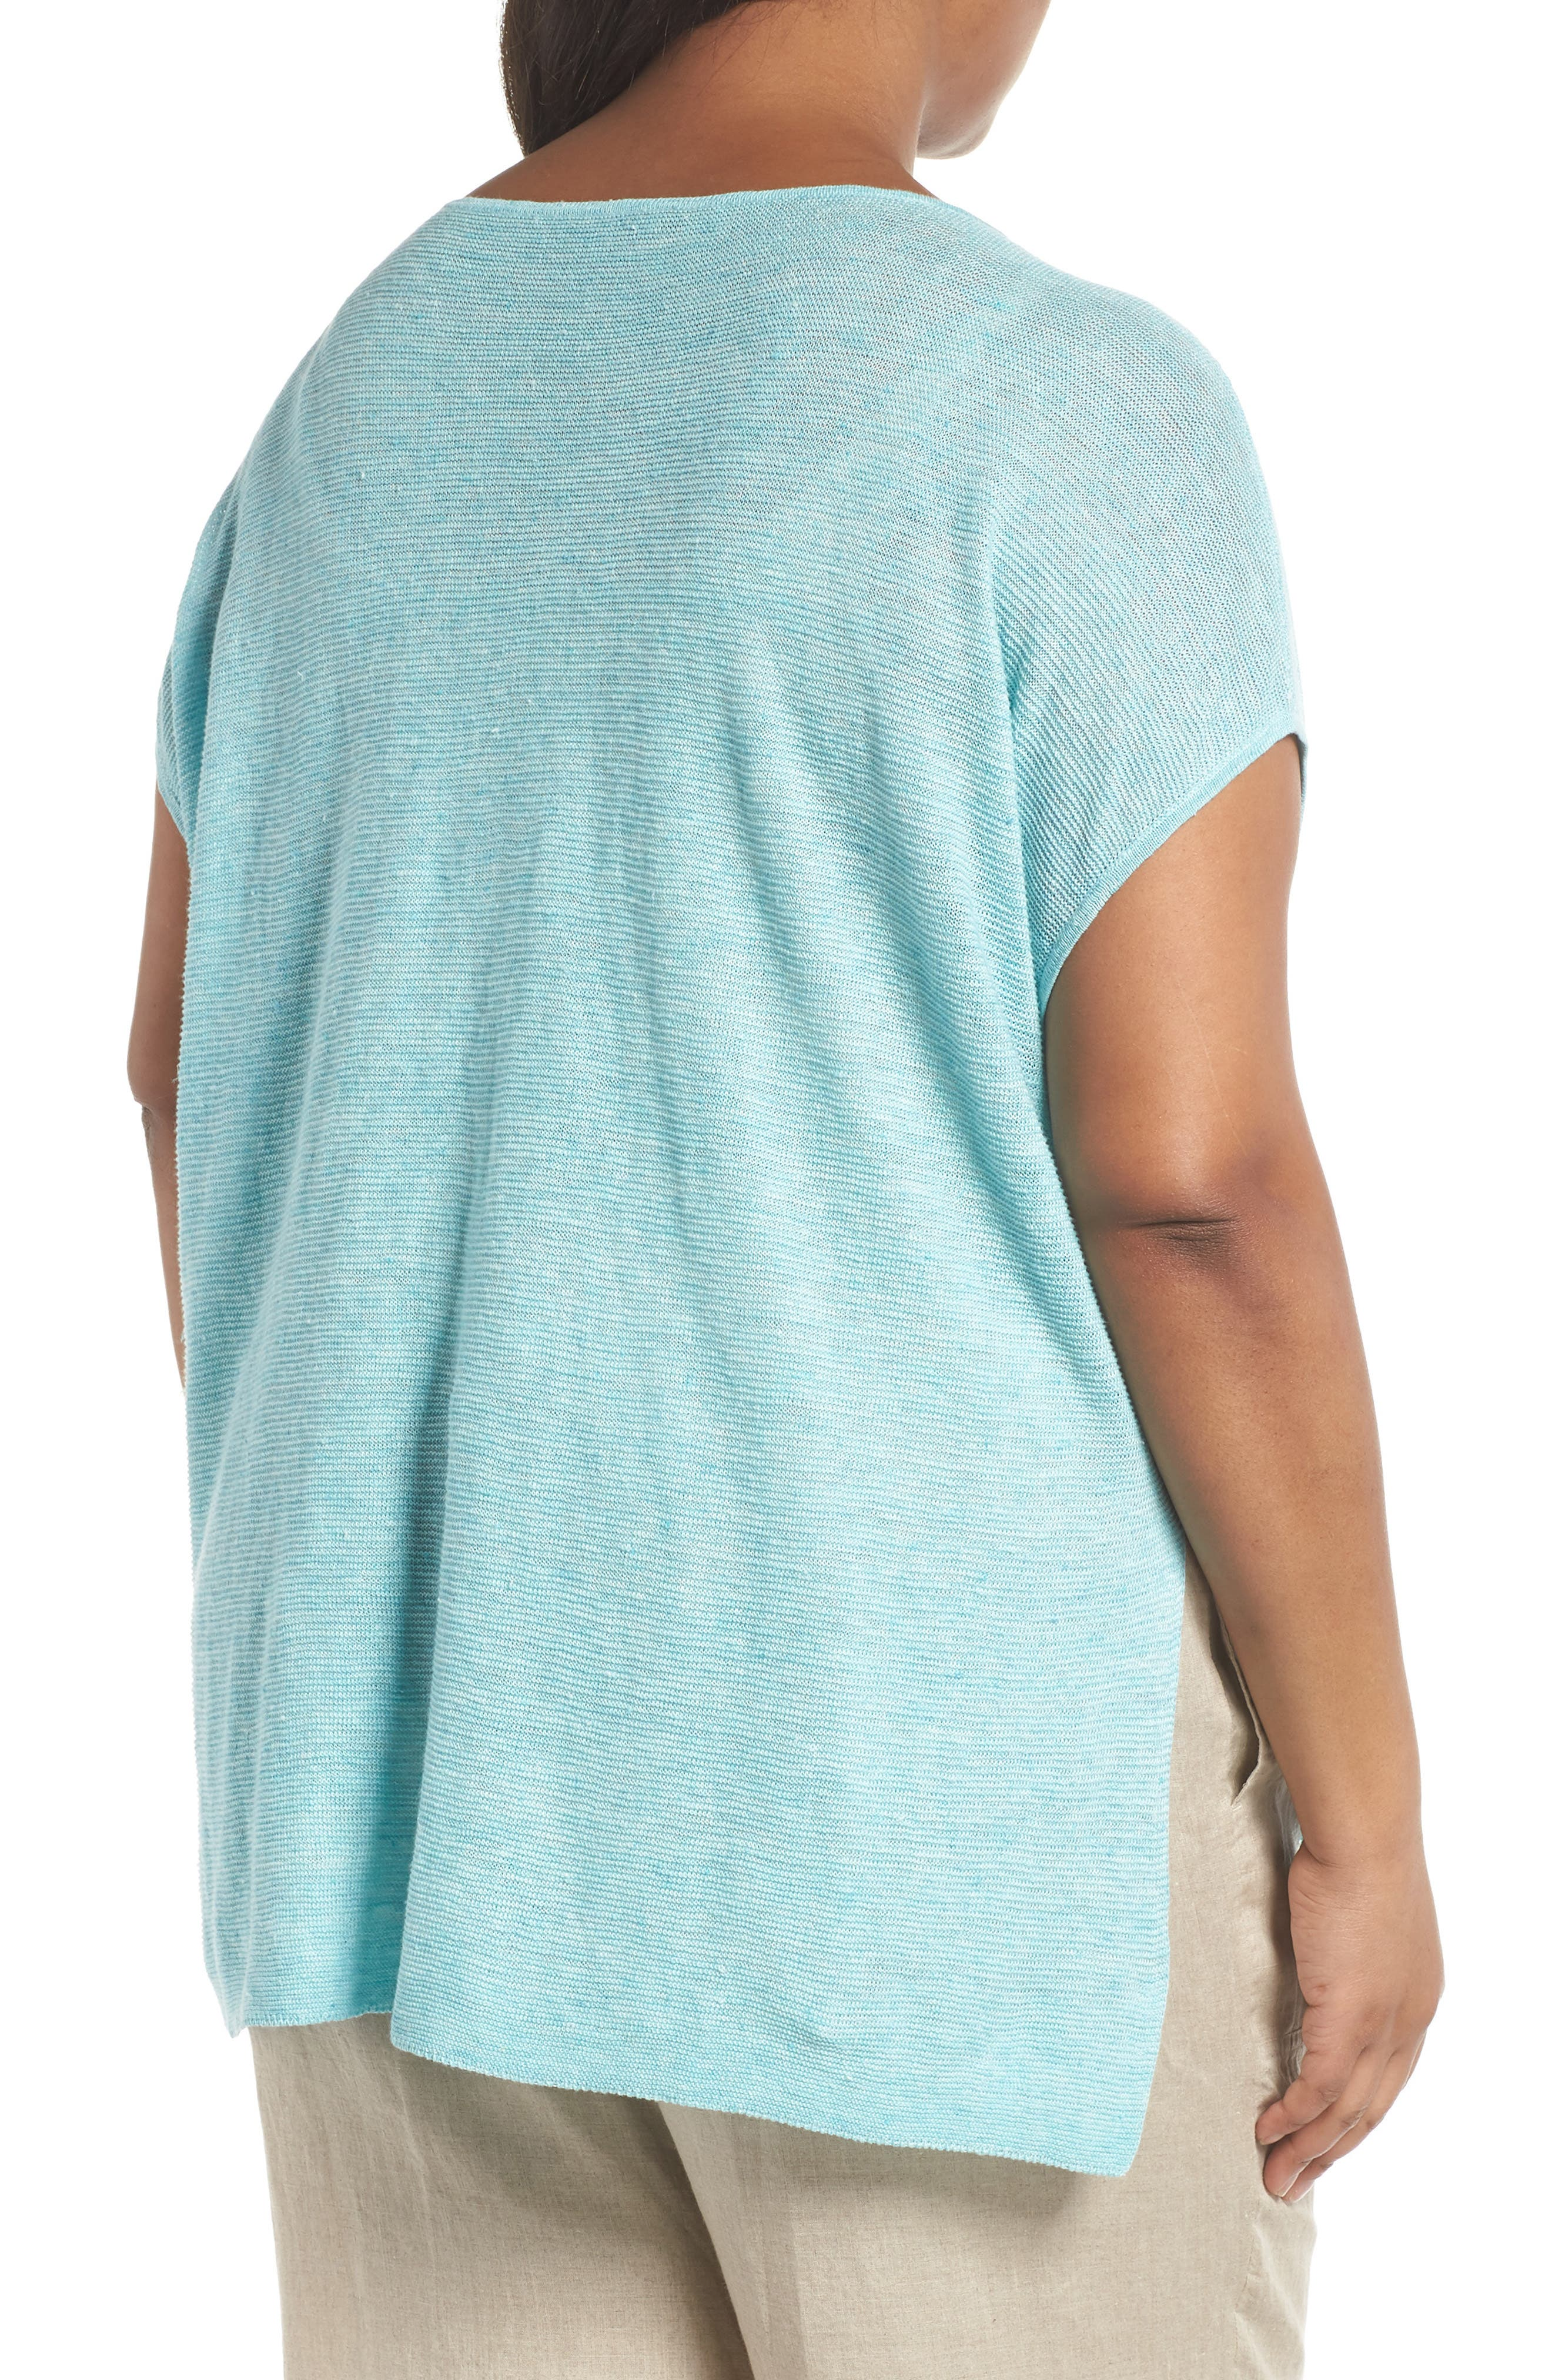 Organic Linen Poncho,                             Alternate thumbnail 2, color,                             Pale Turquoise